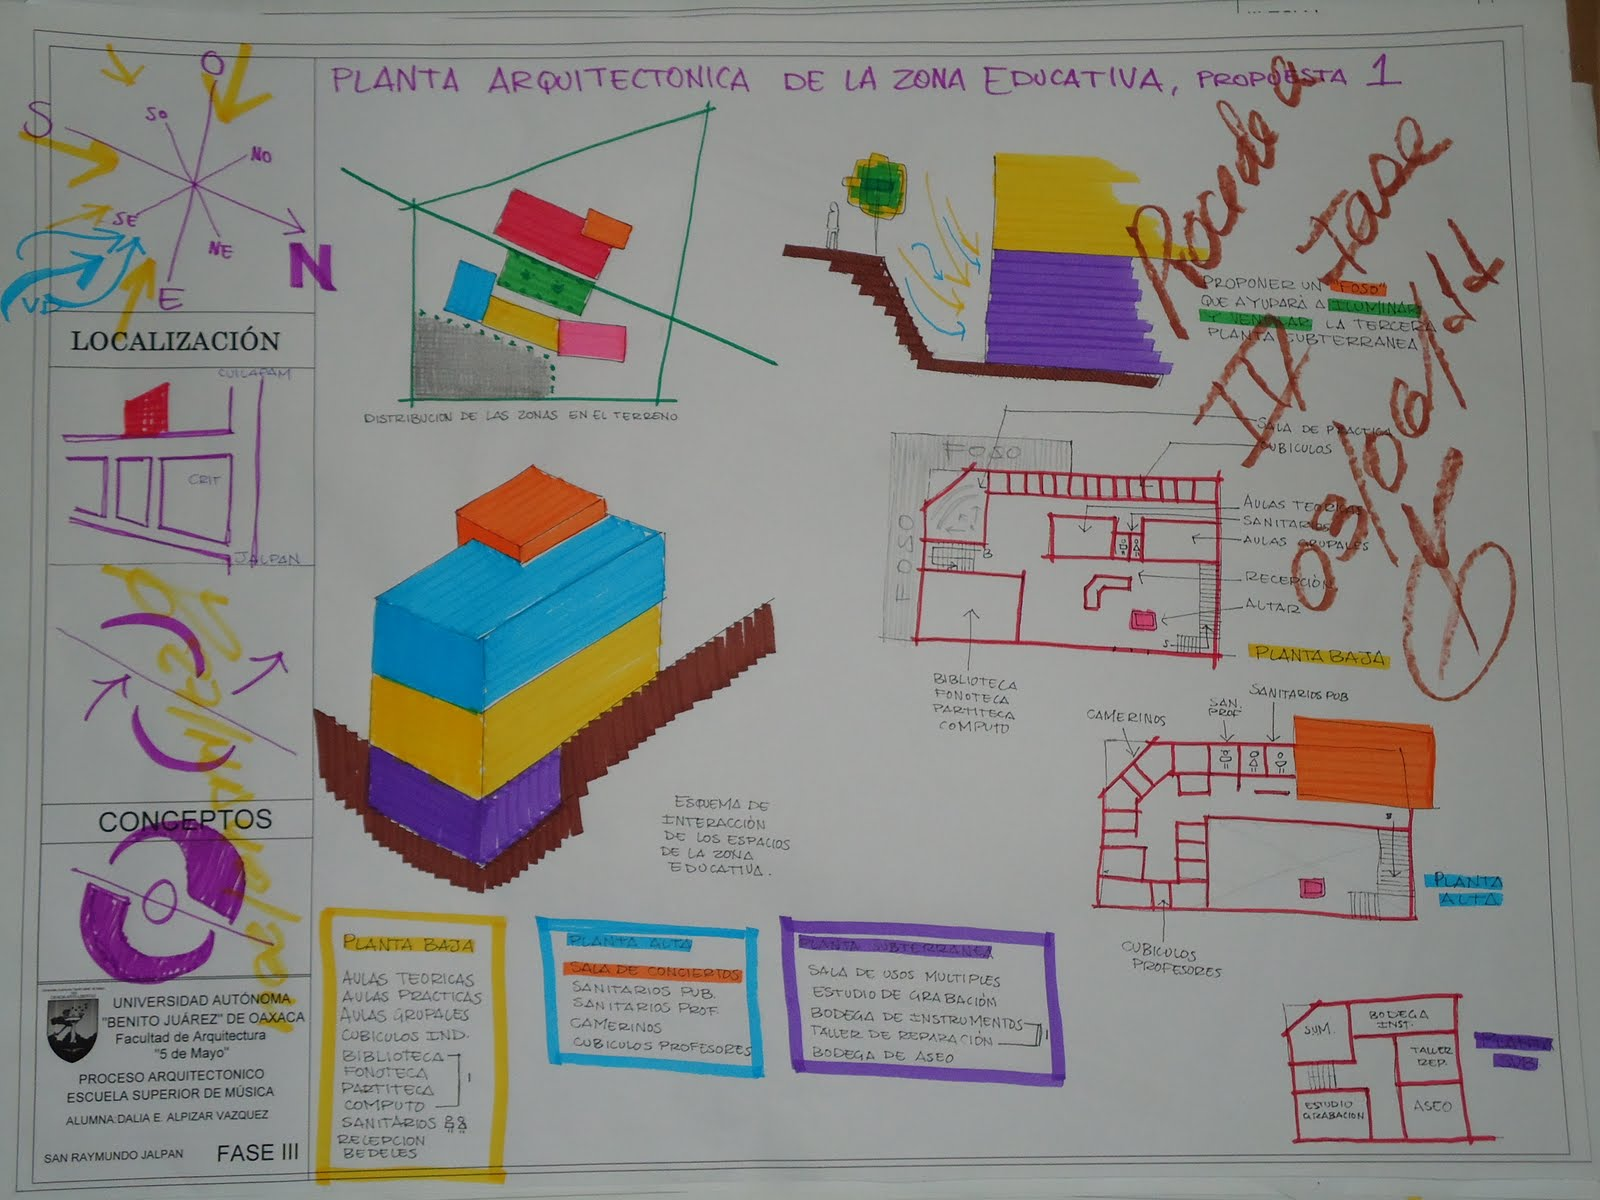 Proceso de dise o escuela superior de musica fase 3 for Planta arquitectonica biblioteca